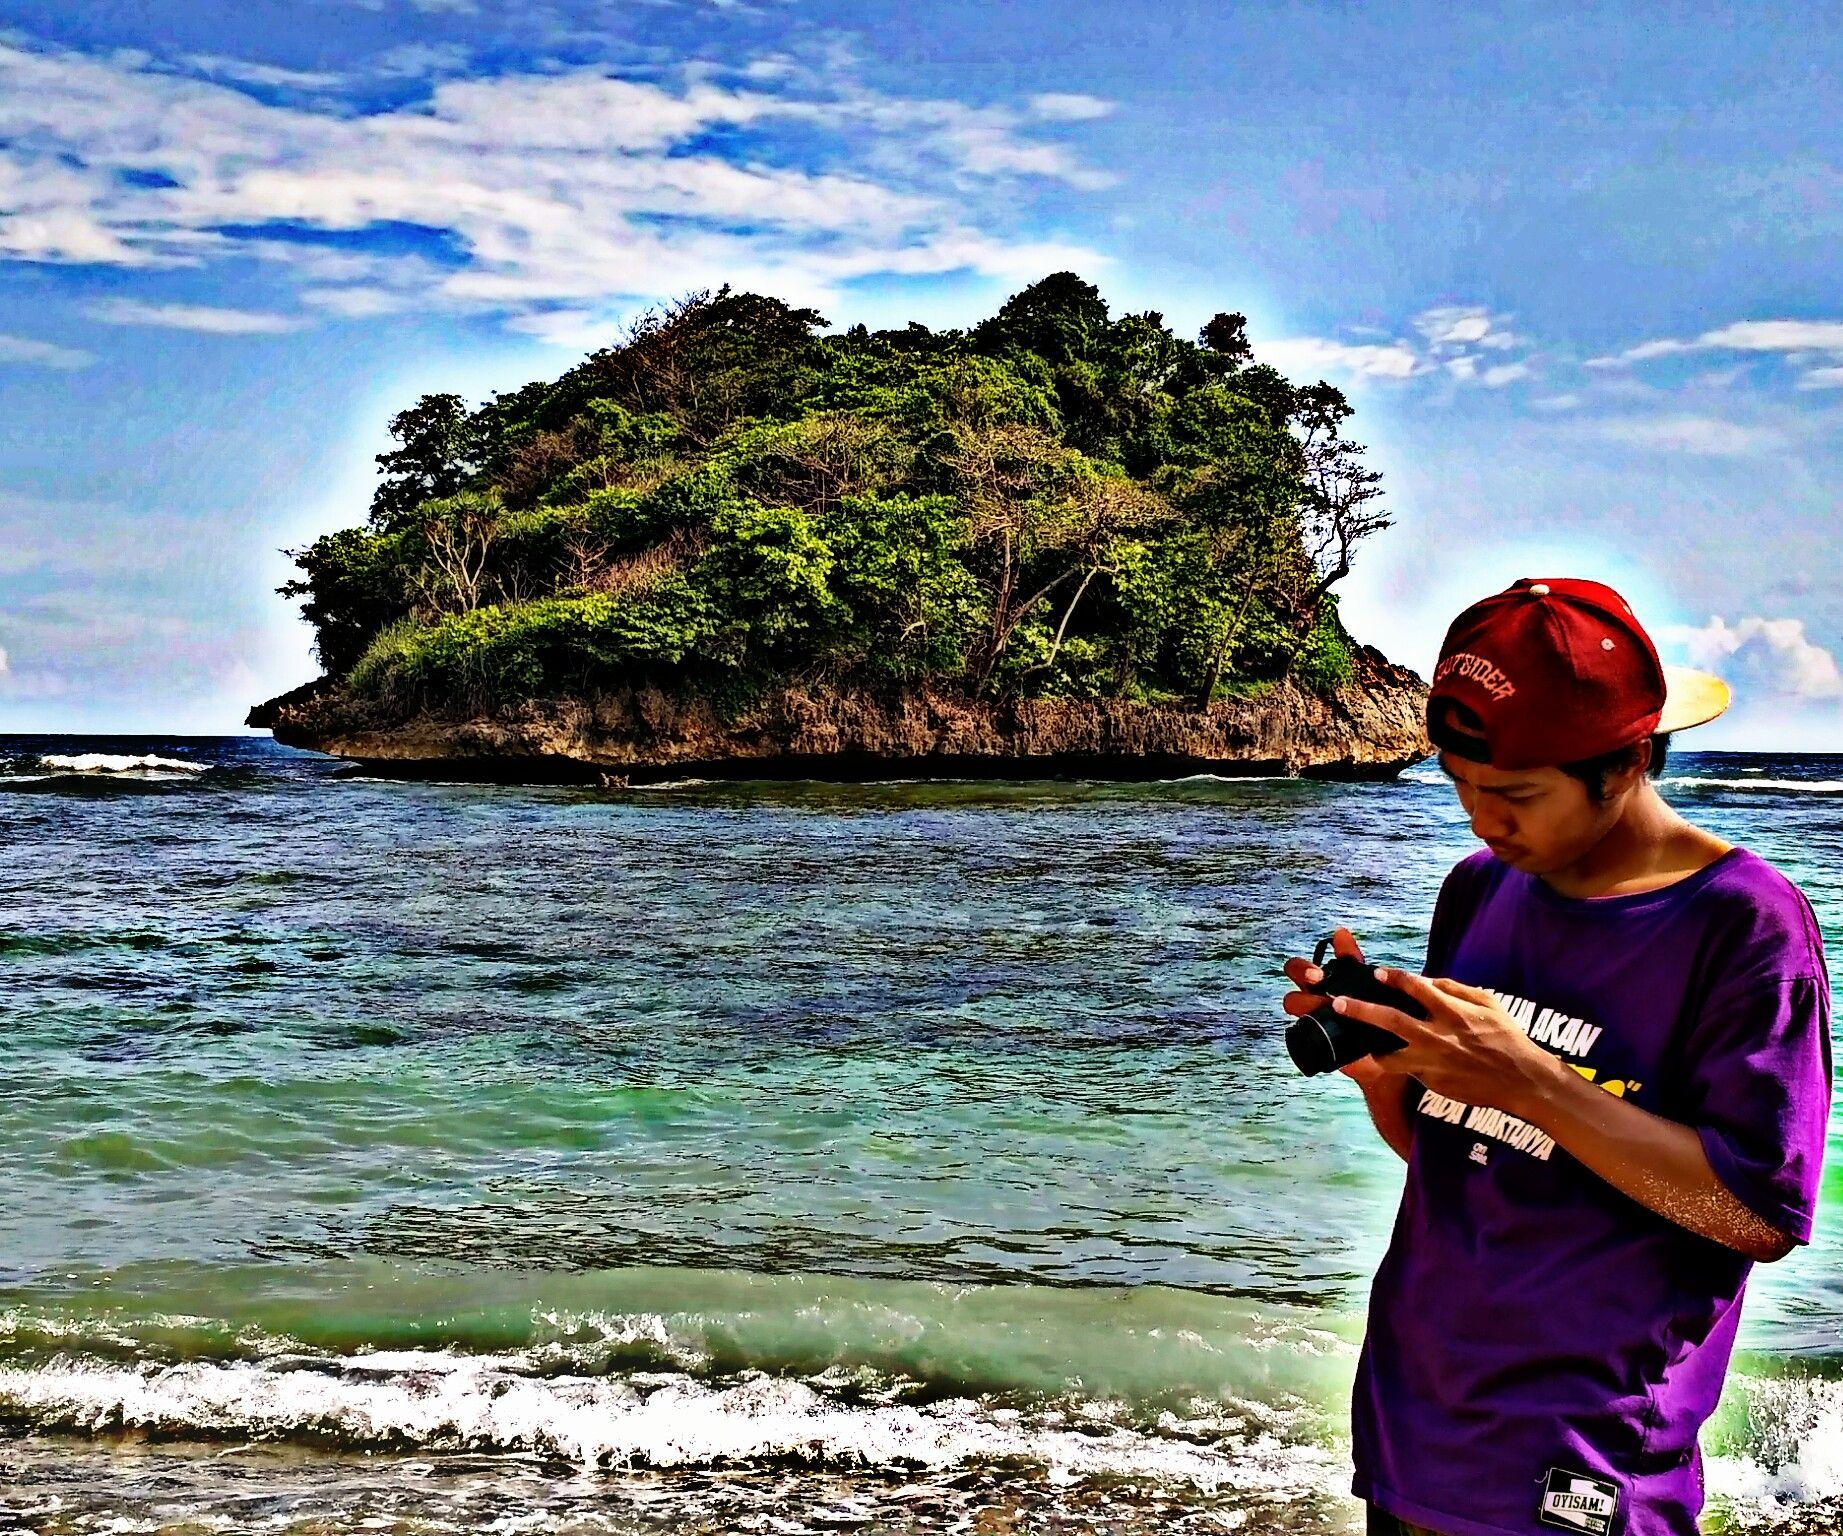 Pantai Teluk Asmoro Teluk Asmara Malang Malang Hits #8: 0dd b9ff5ae587d01e123a f